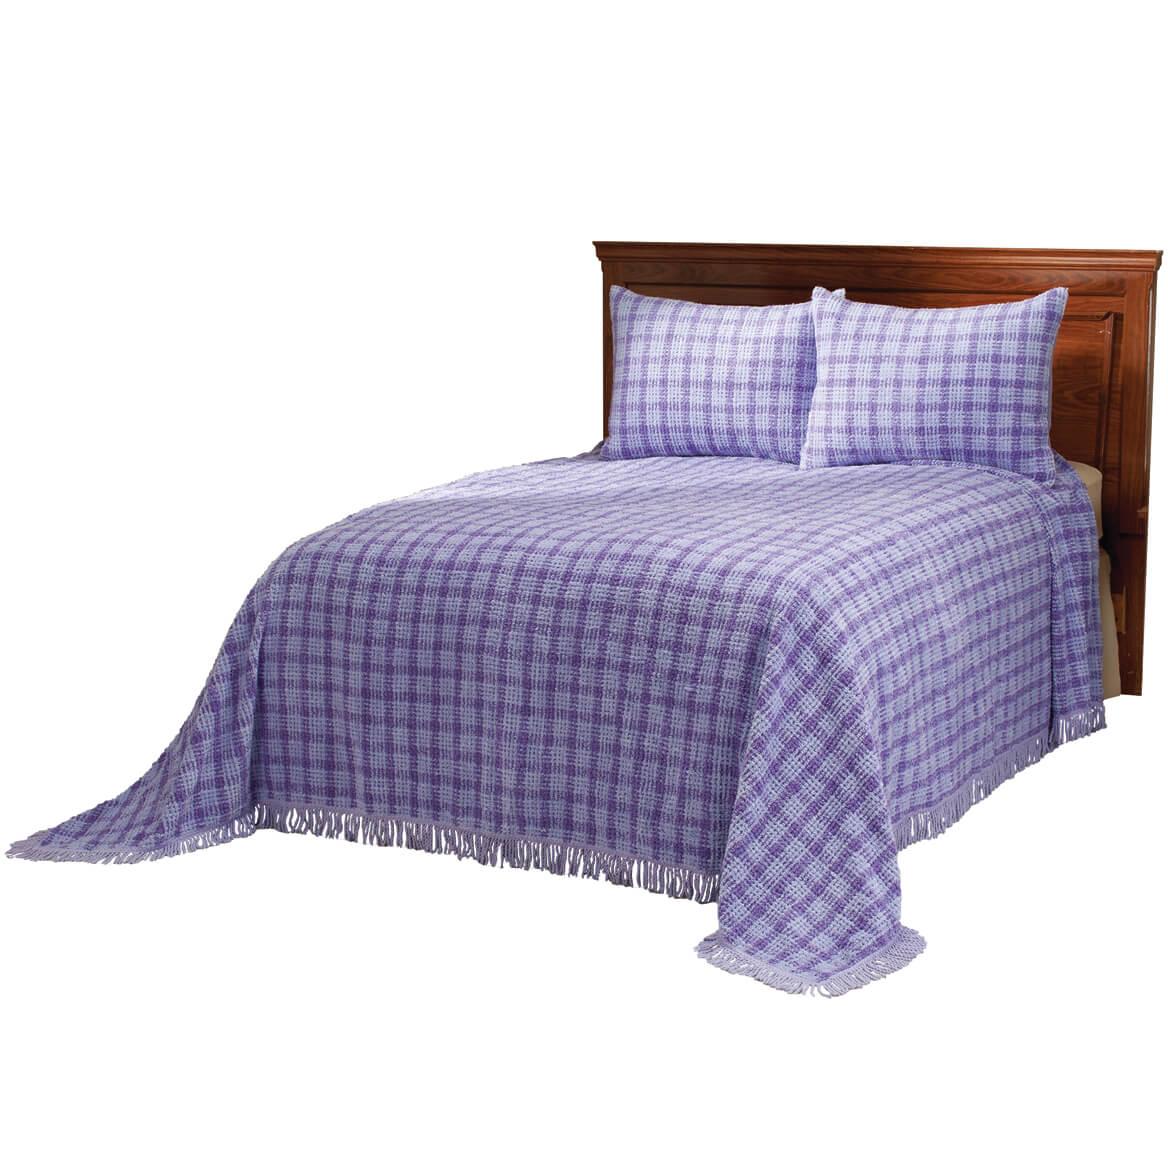 The-Katherine-Chenille-Bedspread-by-OakRidgeTM thumbnail 18